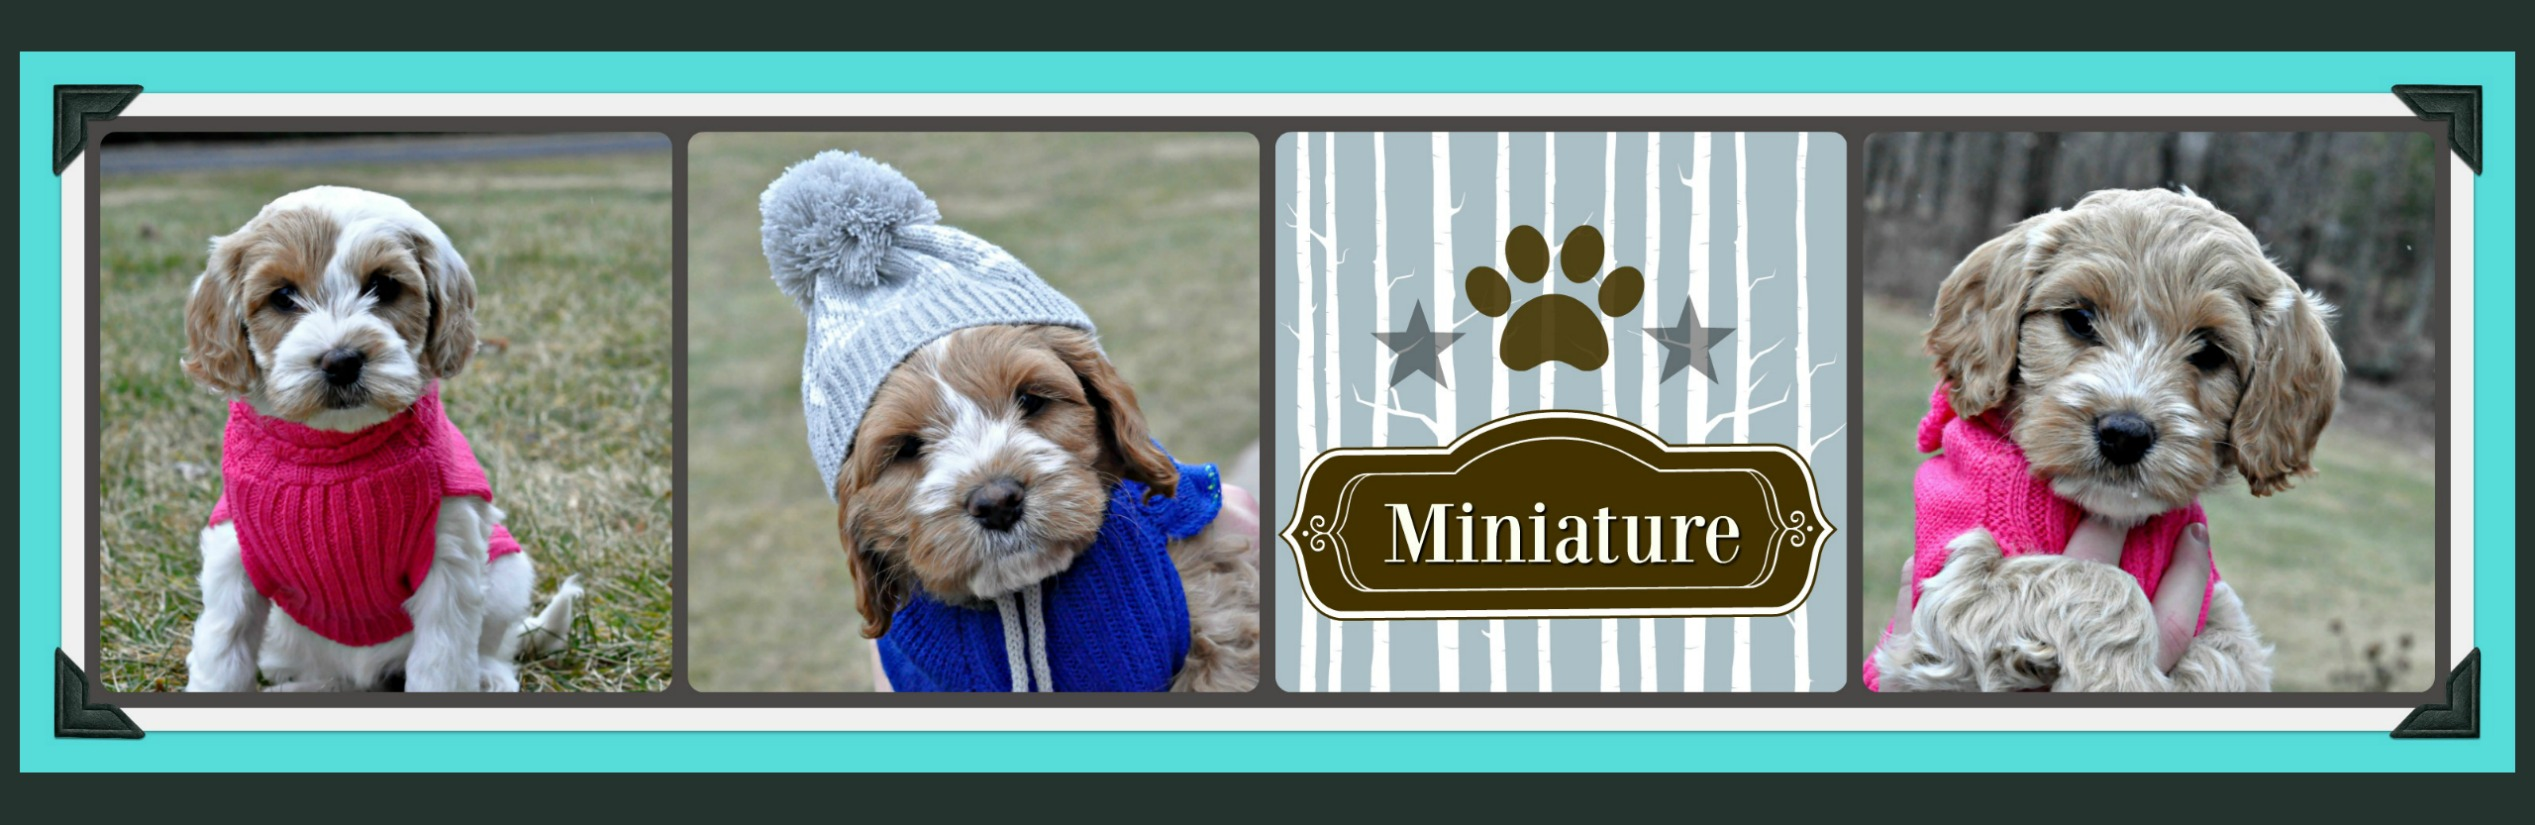 Miniature-2